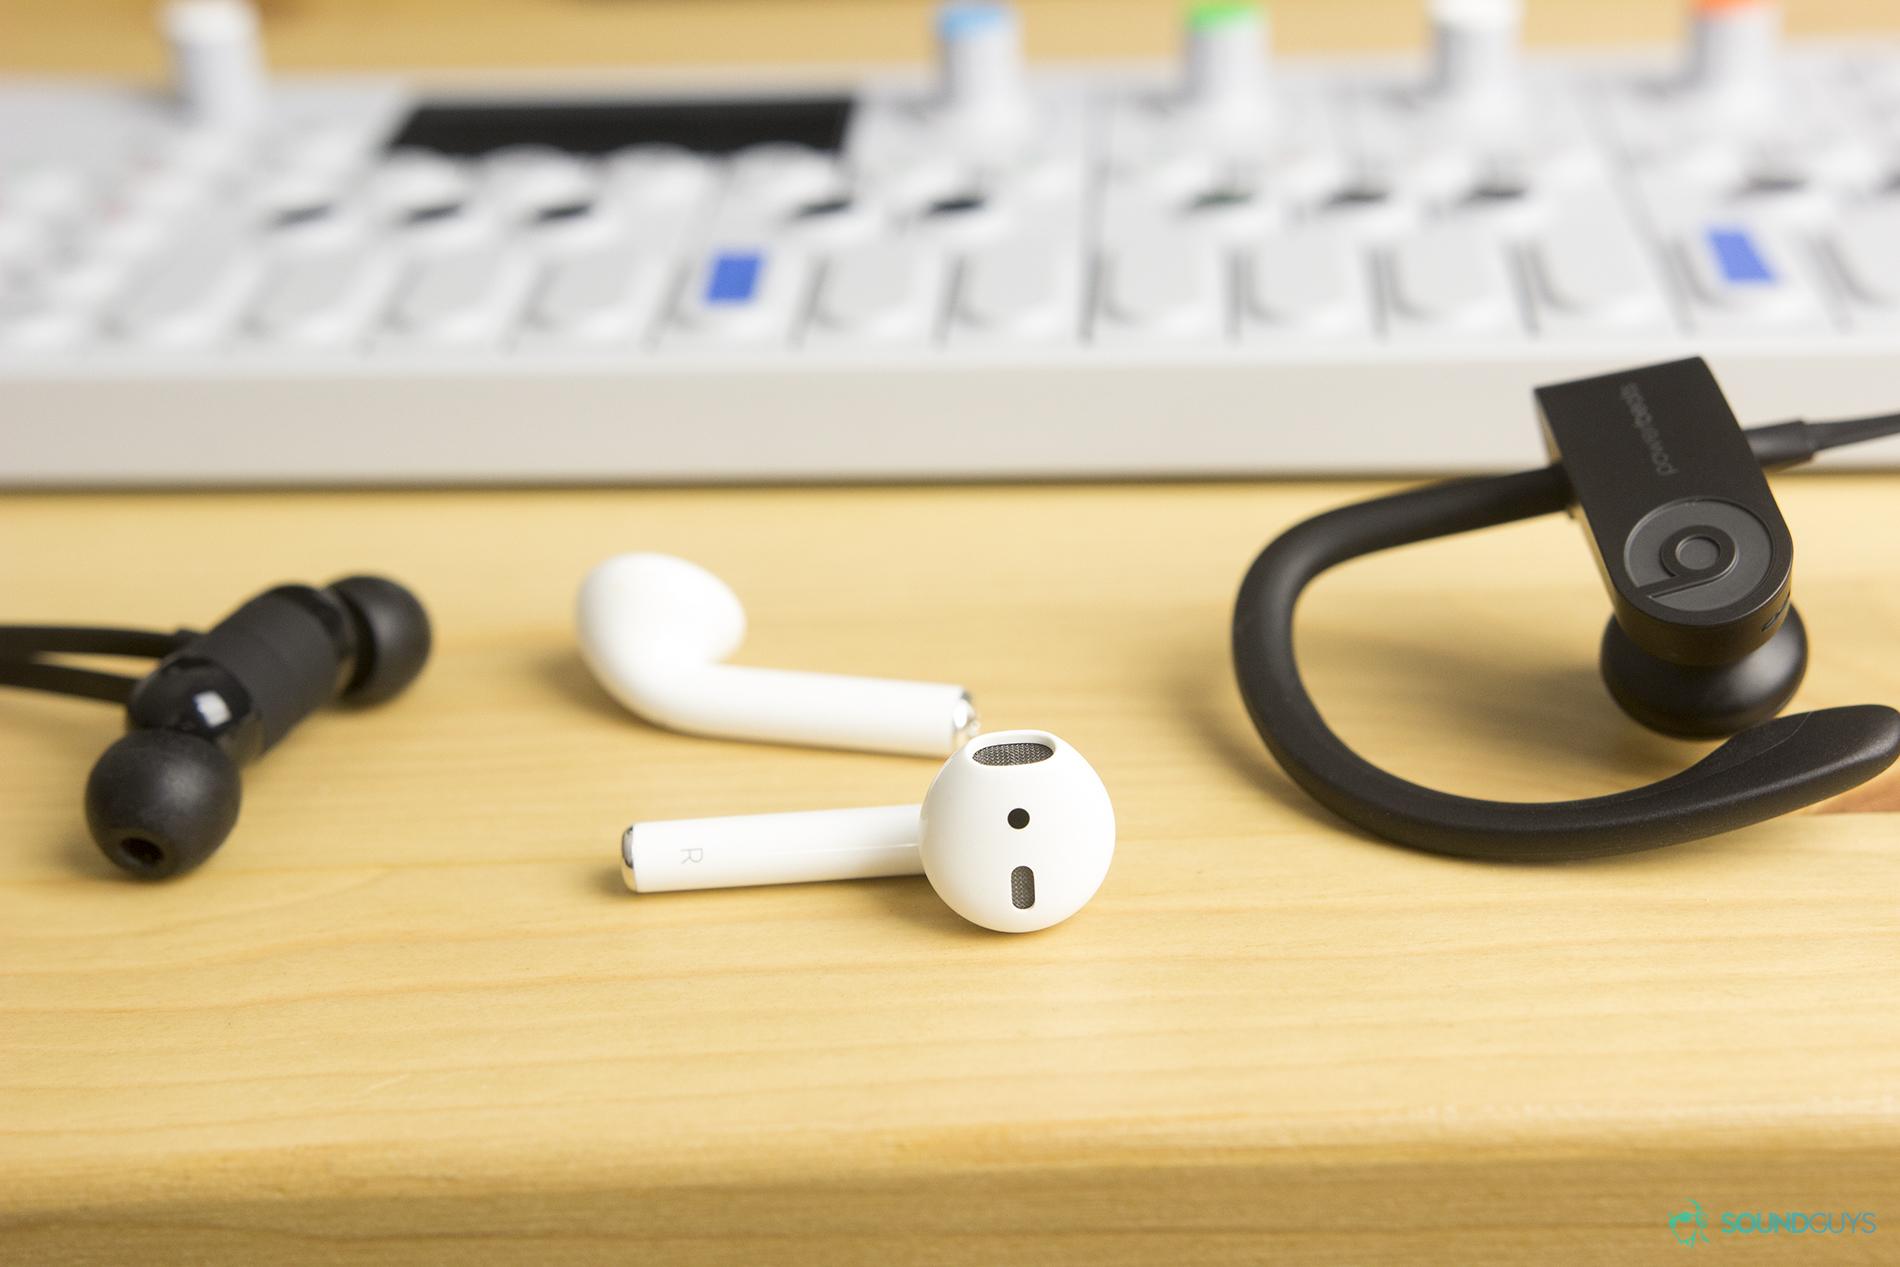 Best Beats Headphones Soundguys Headphone Jack Wiring Diagram Curious About Wireless Earbuds